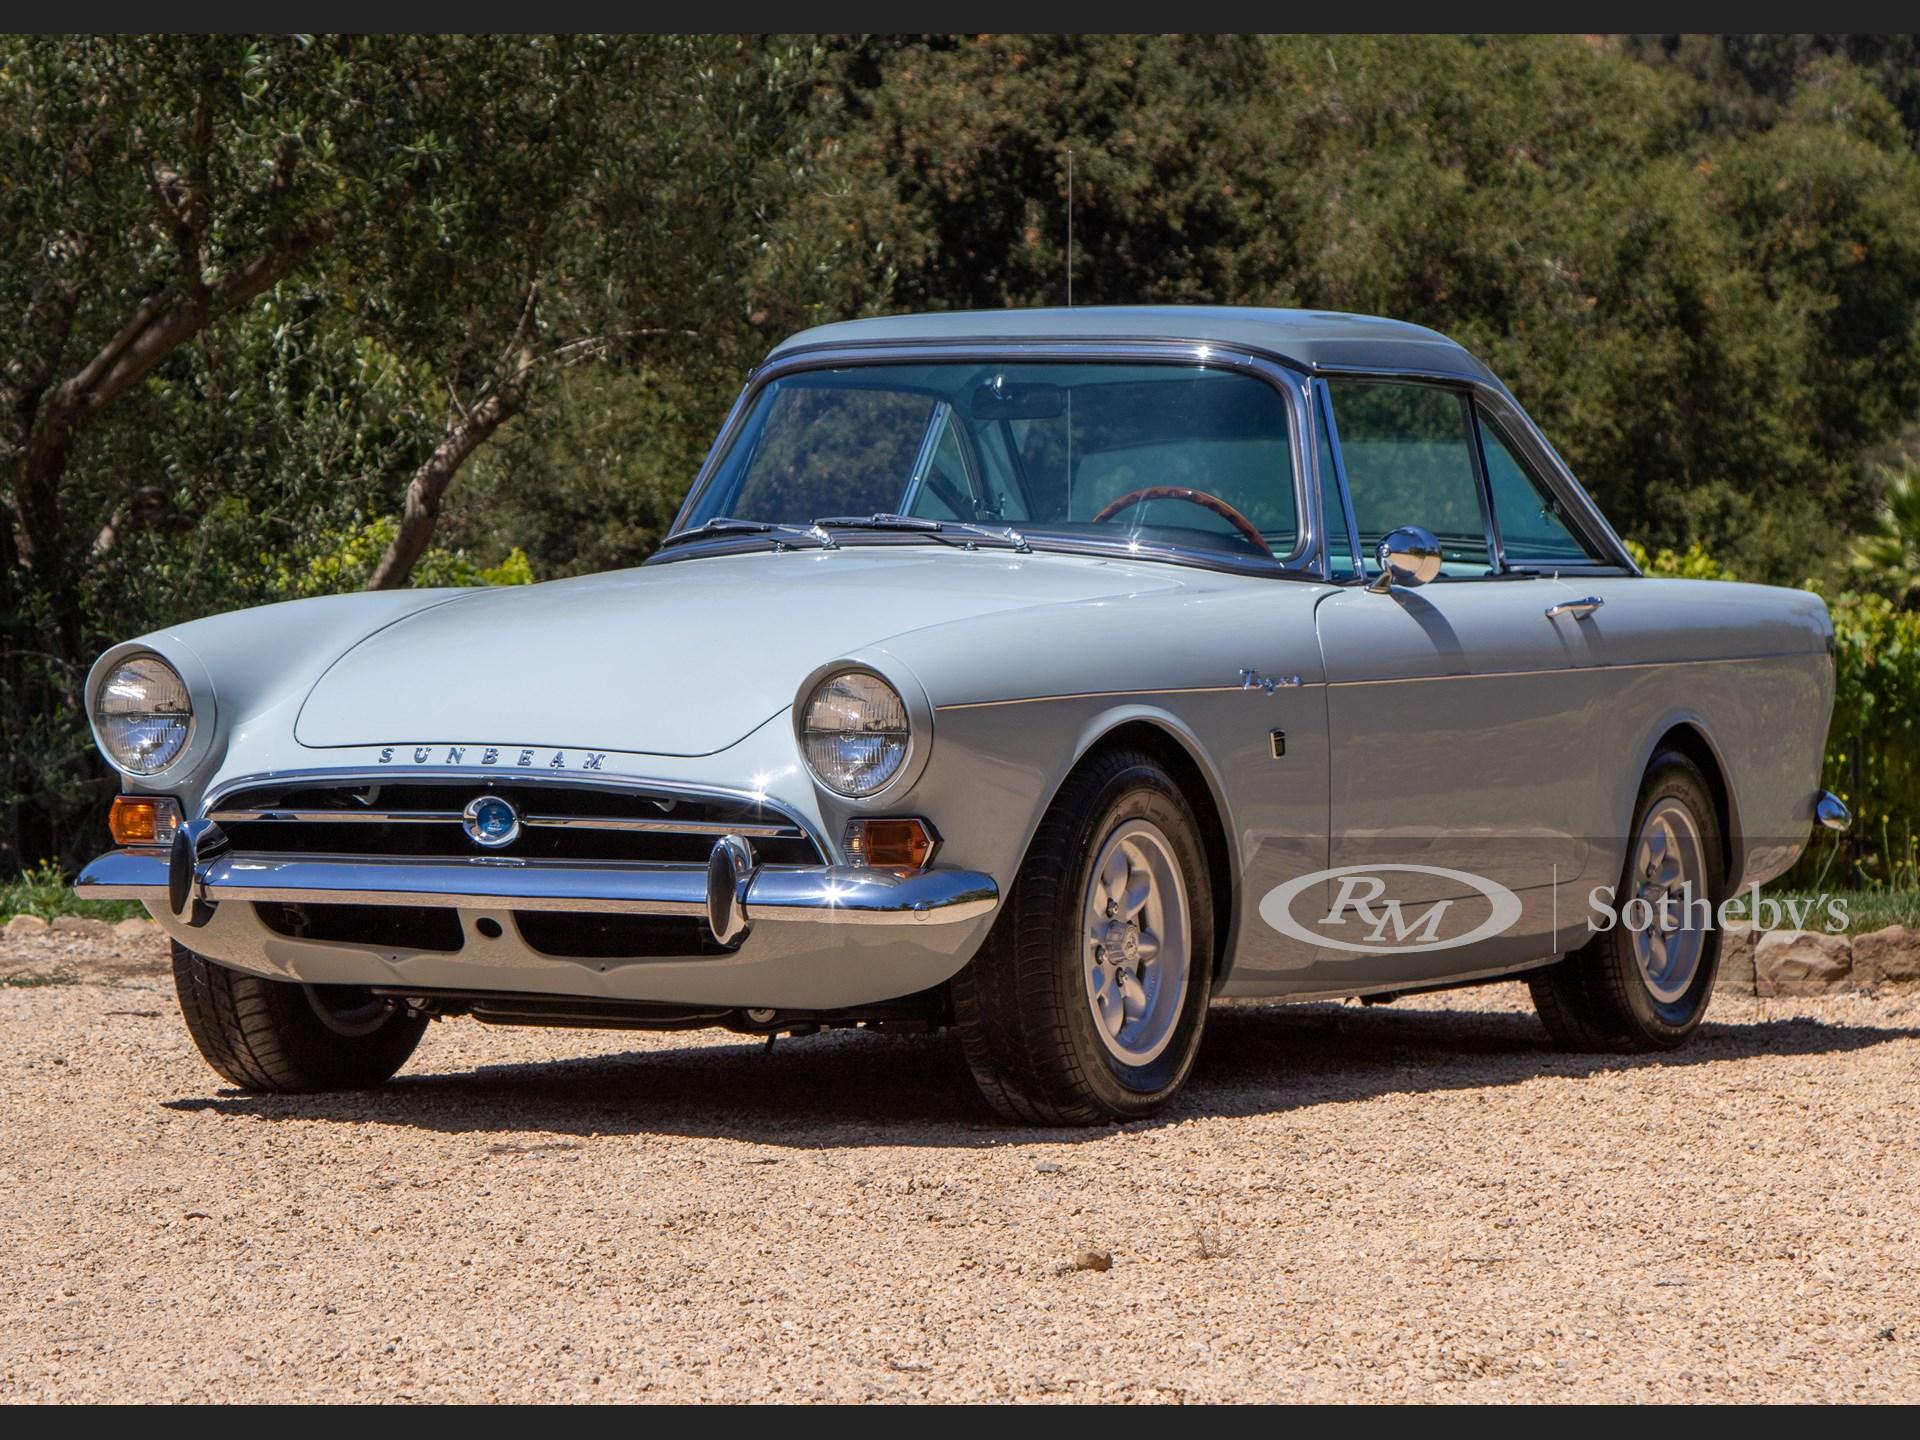 1964 Sunbeam Tiger Mk 1